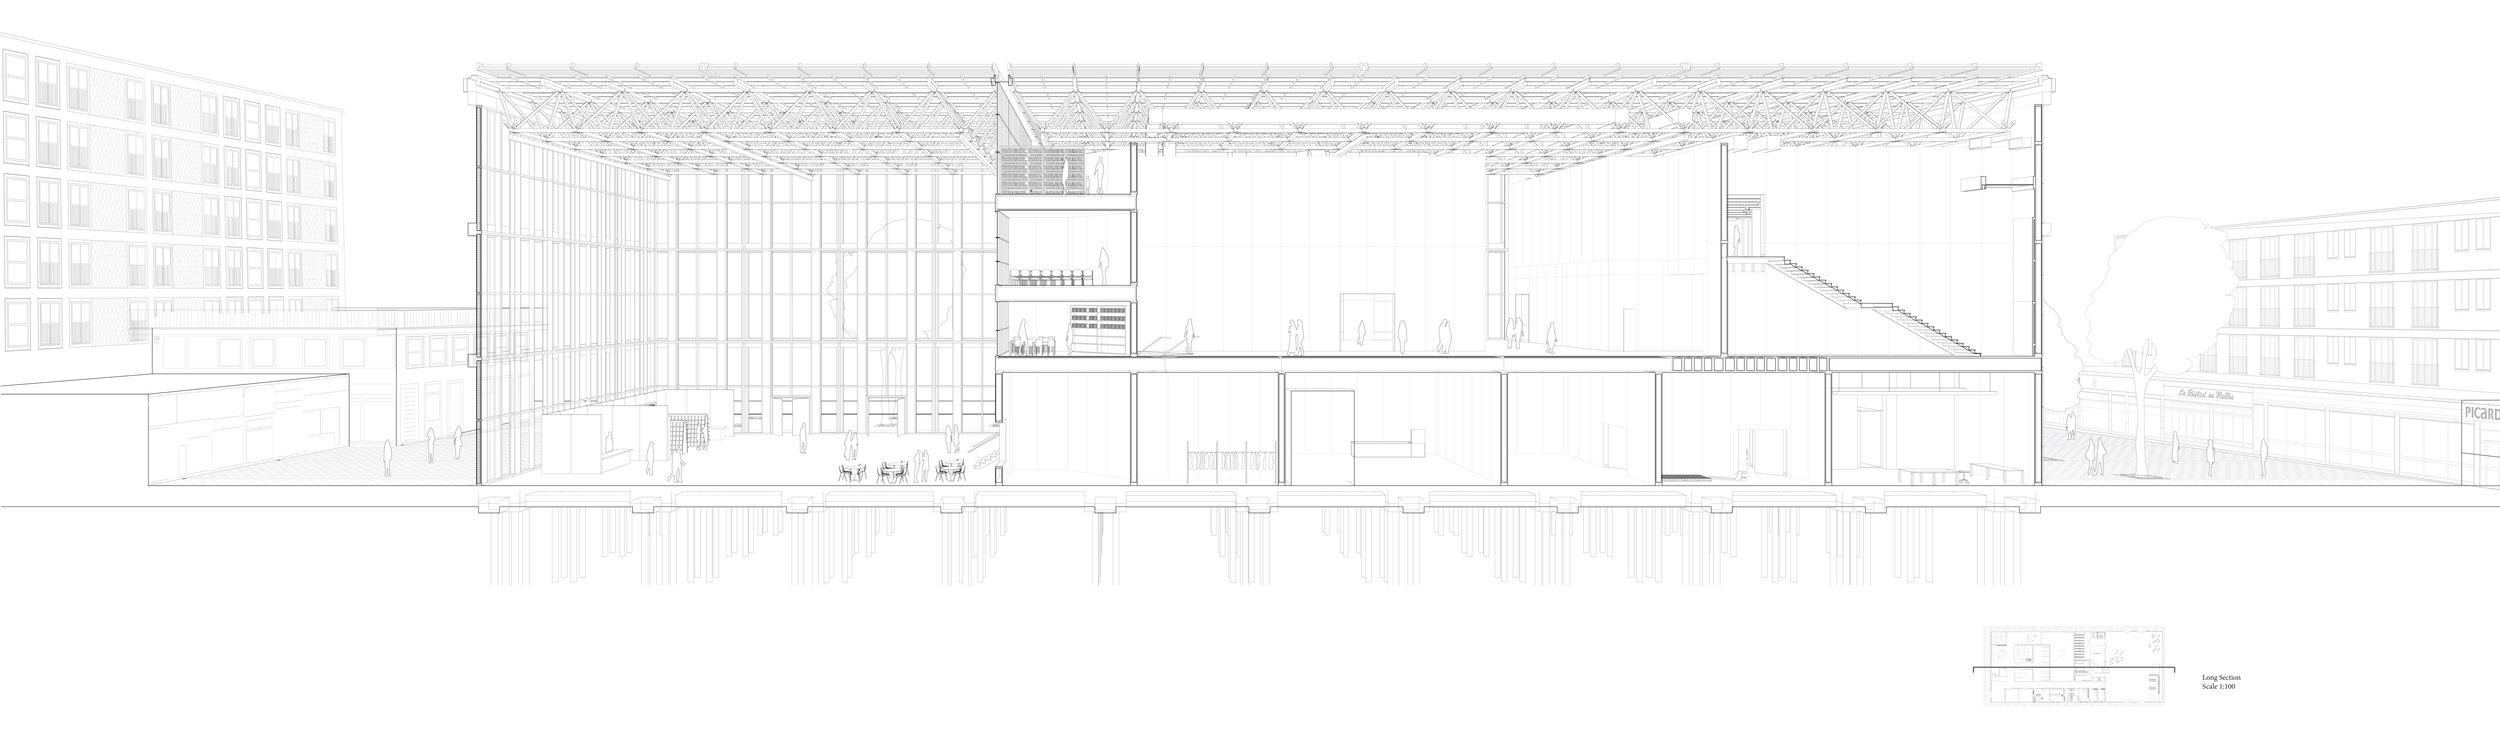 Long Section Coridor.jpg